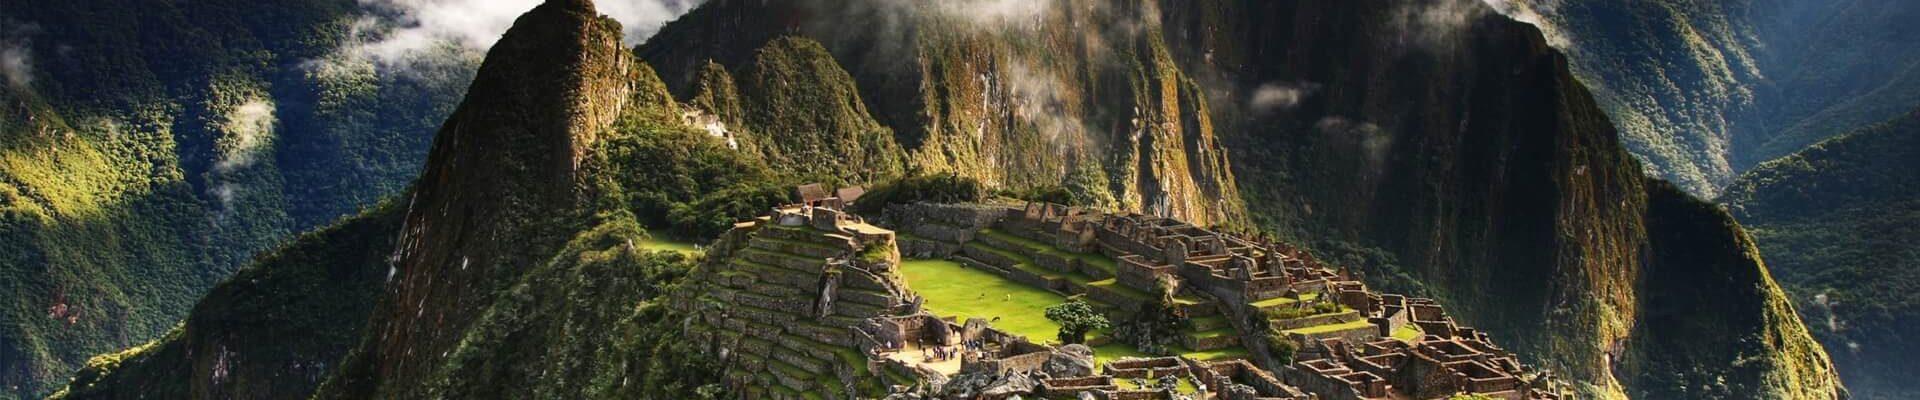 Peru İklimi ve Hava Durumu